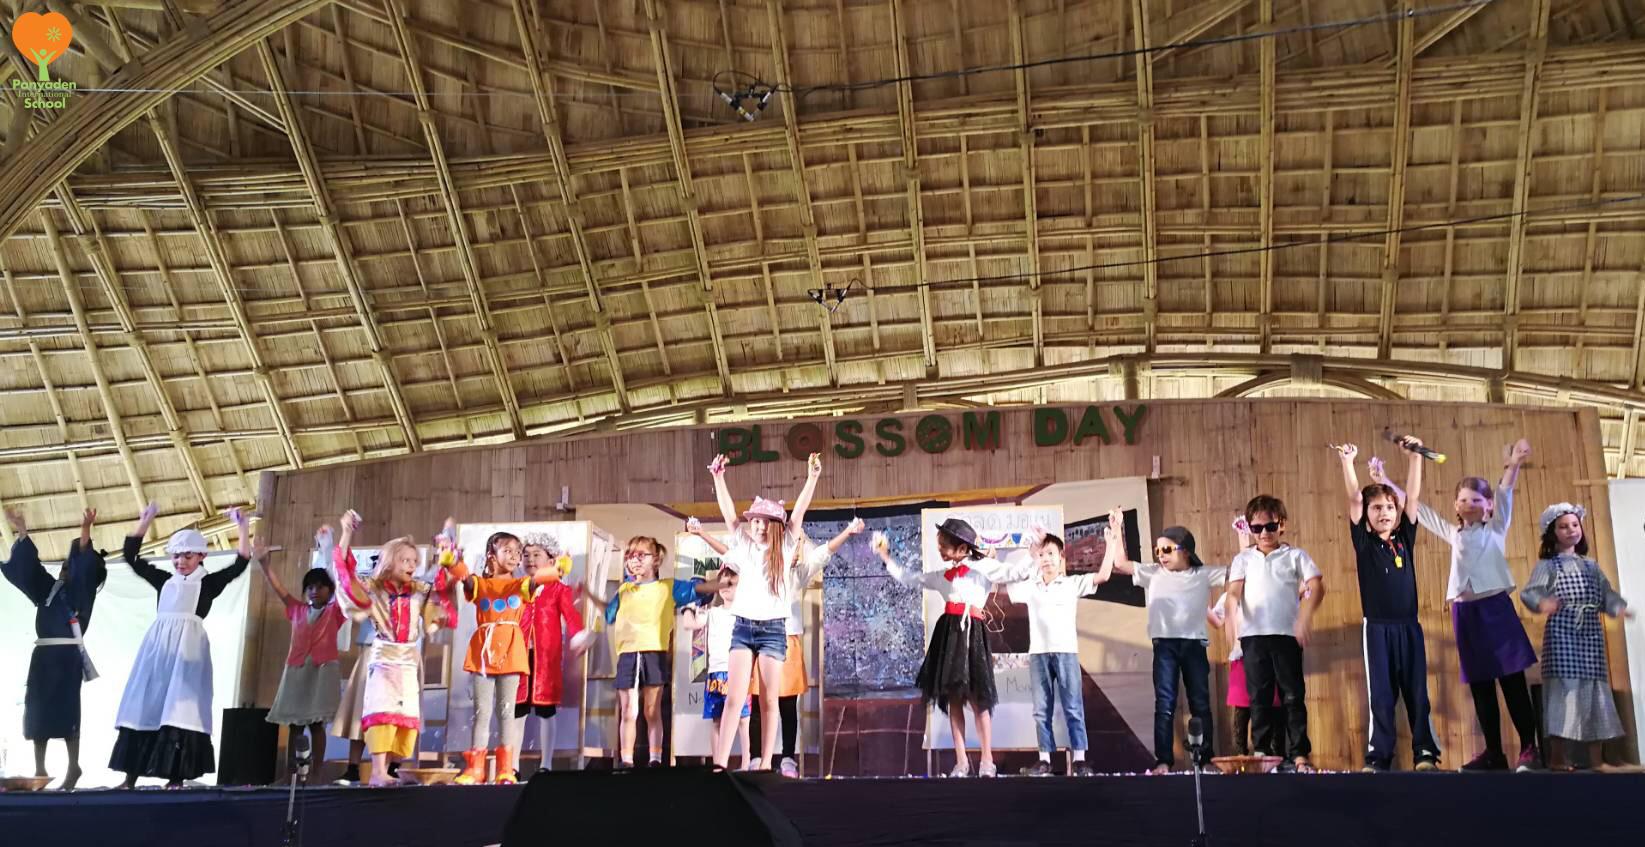 Panyaden Blossom Day 2017 celebration show